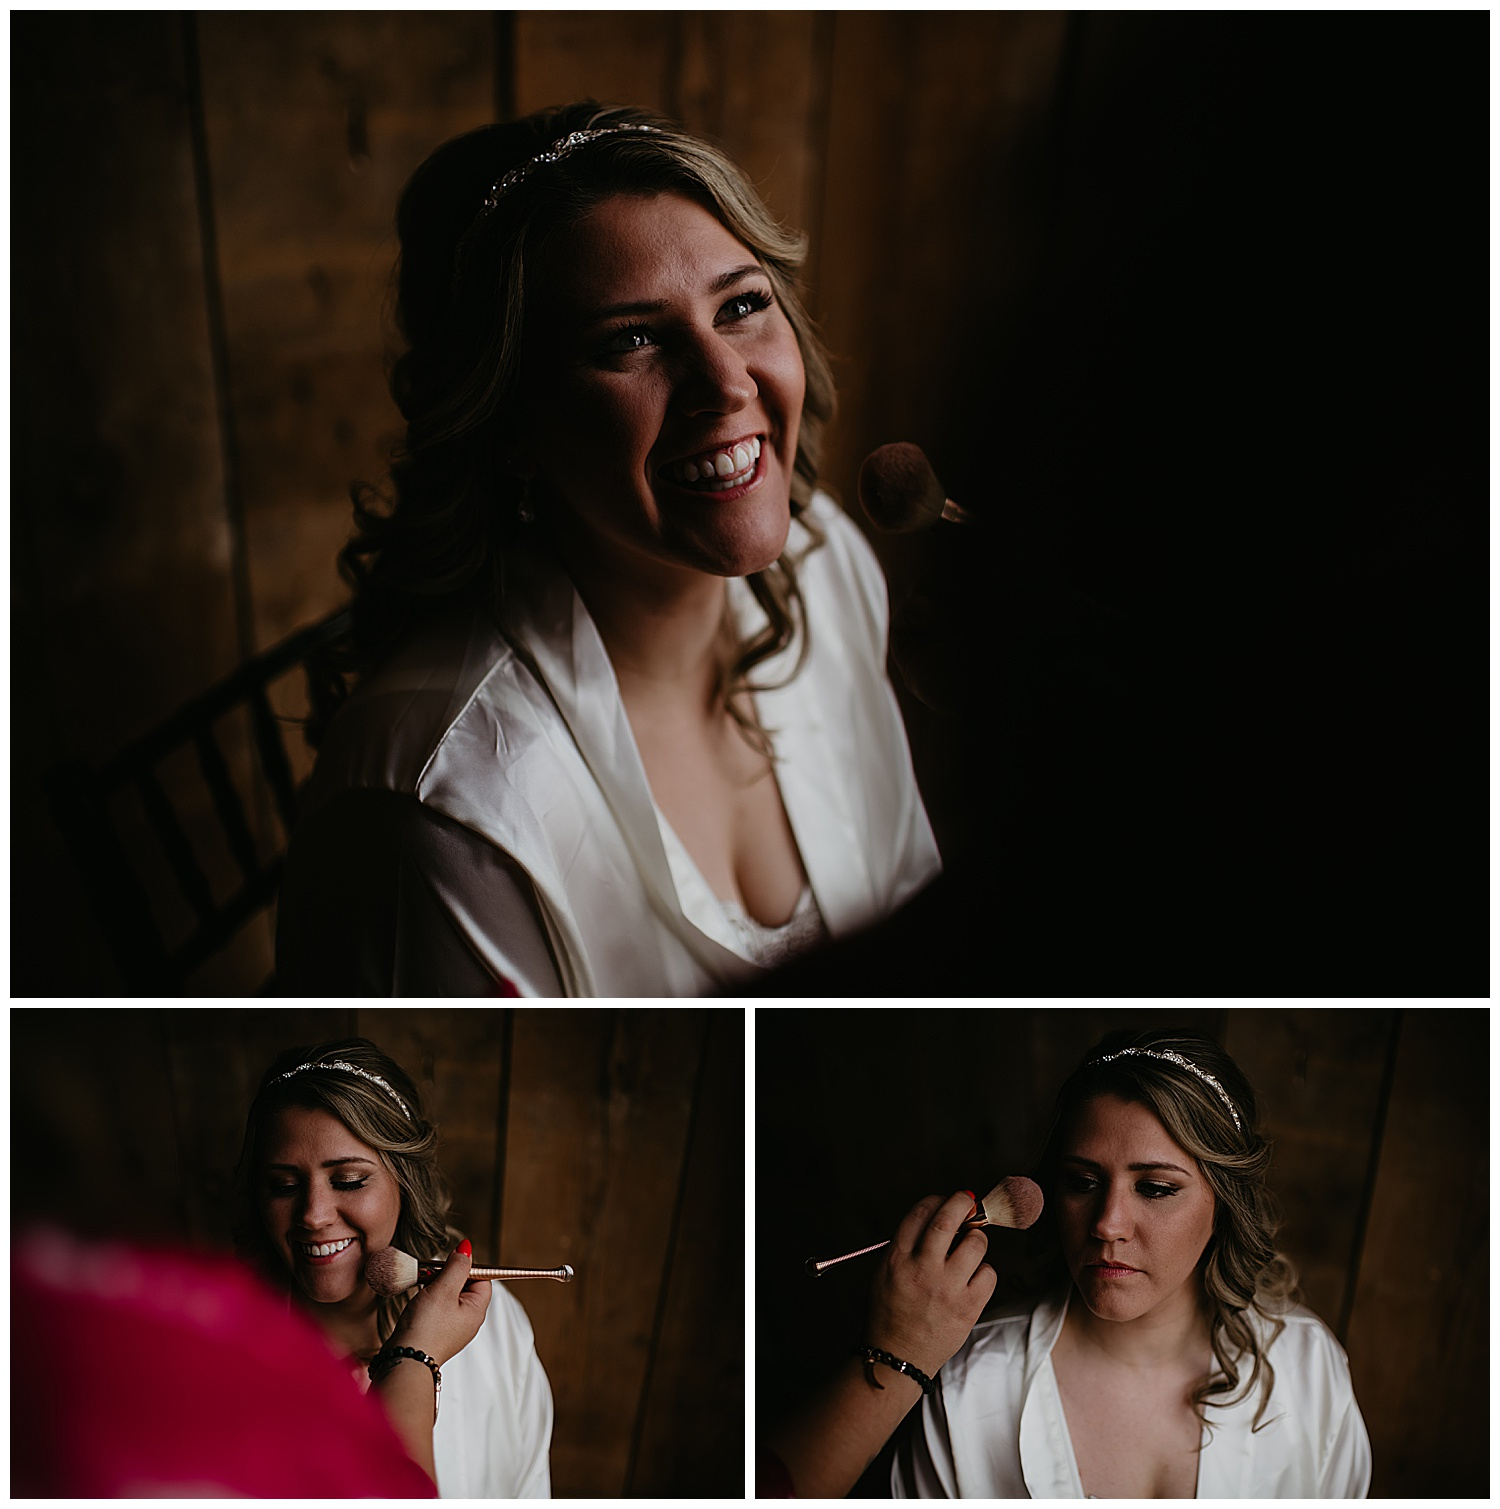 NEPA-Bloomgsburg-Wedding-Photographer-at-The-Barn-at-Greystone-Farms-Watsontown-PA_0120.jpg